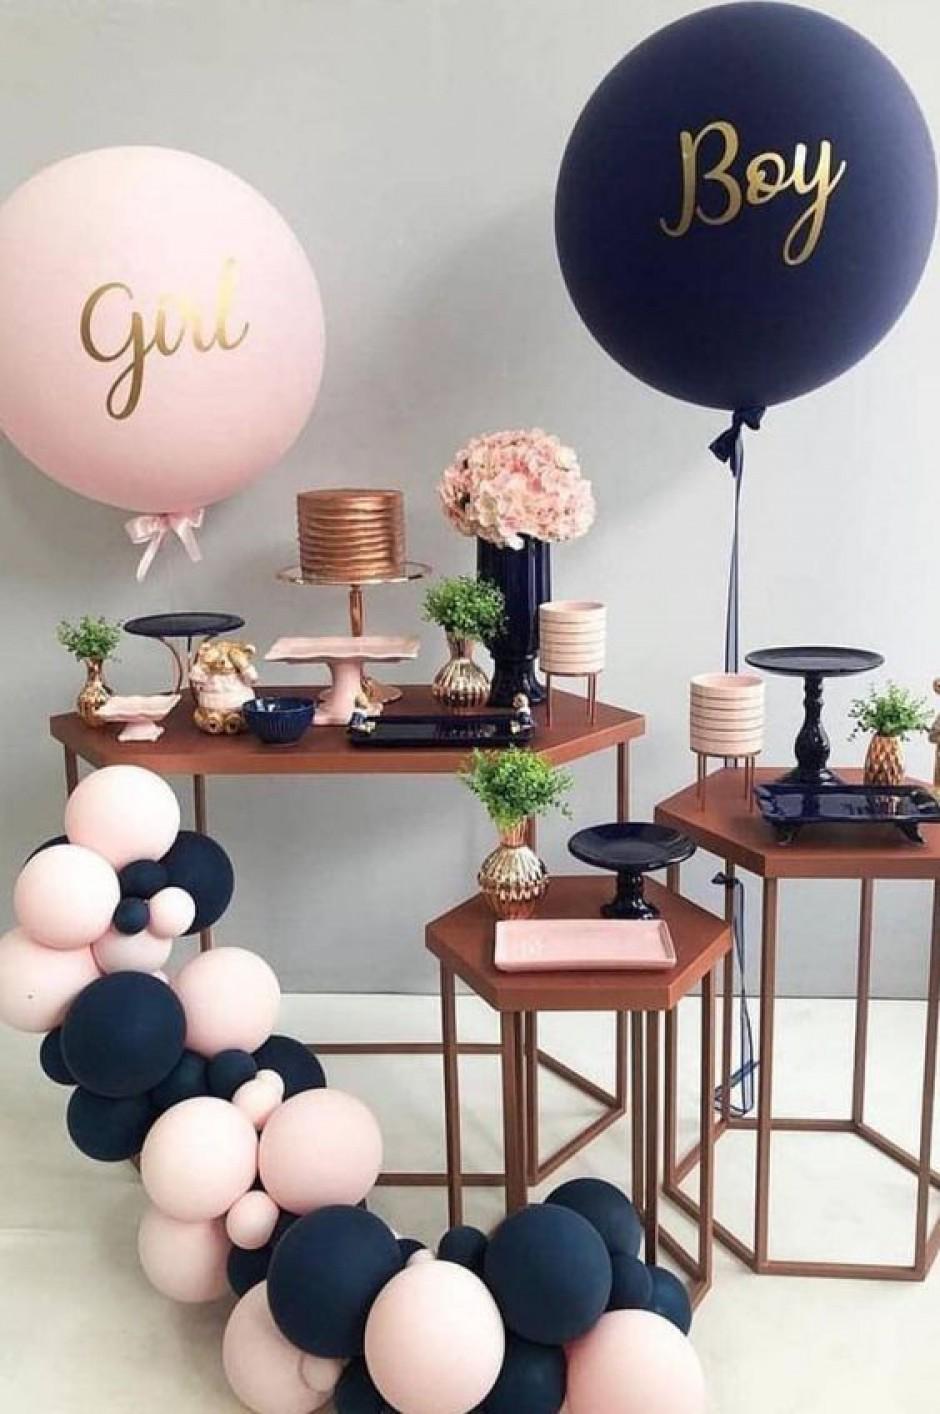 Organizzare un baby shower con le collette online